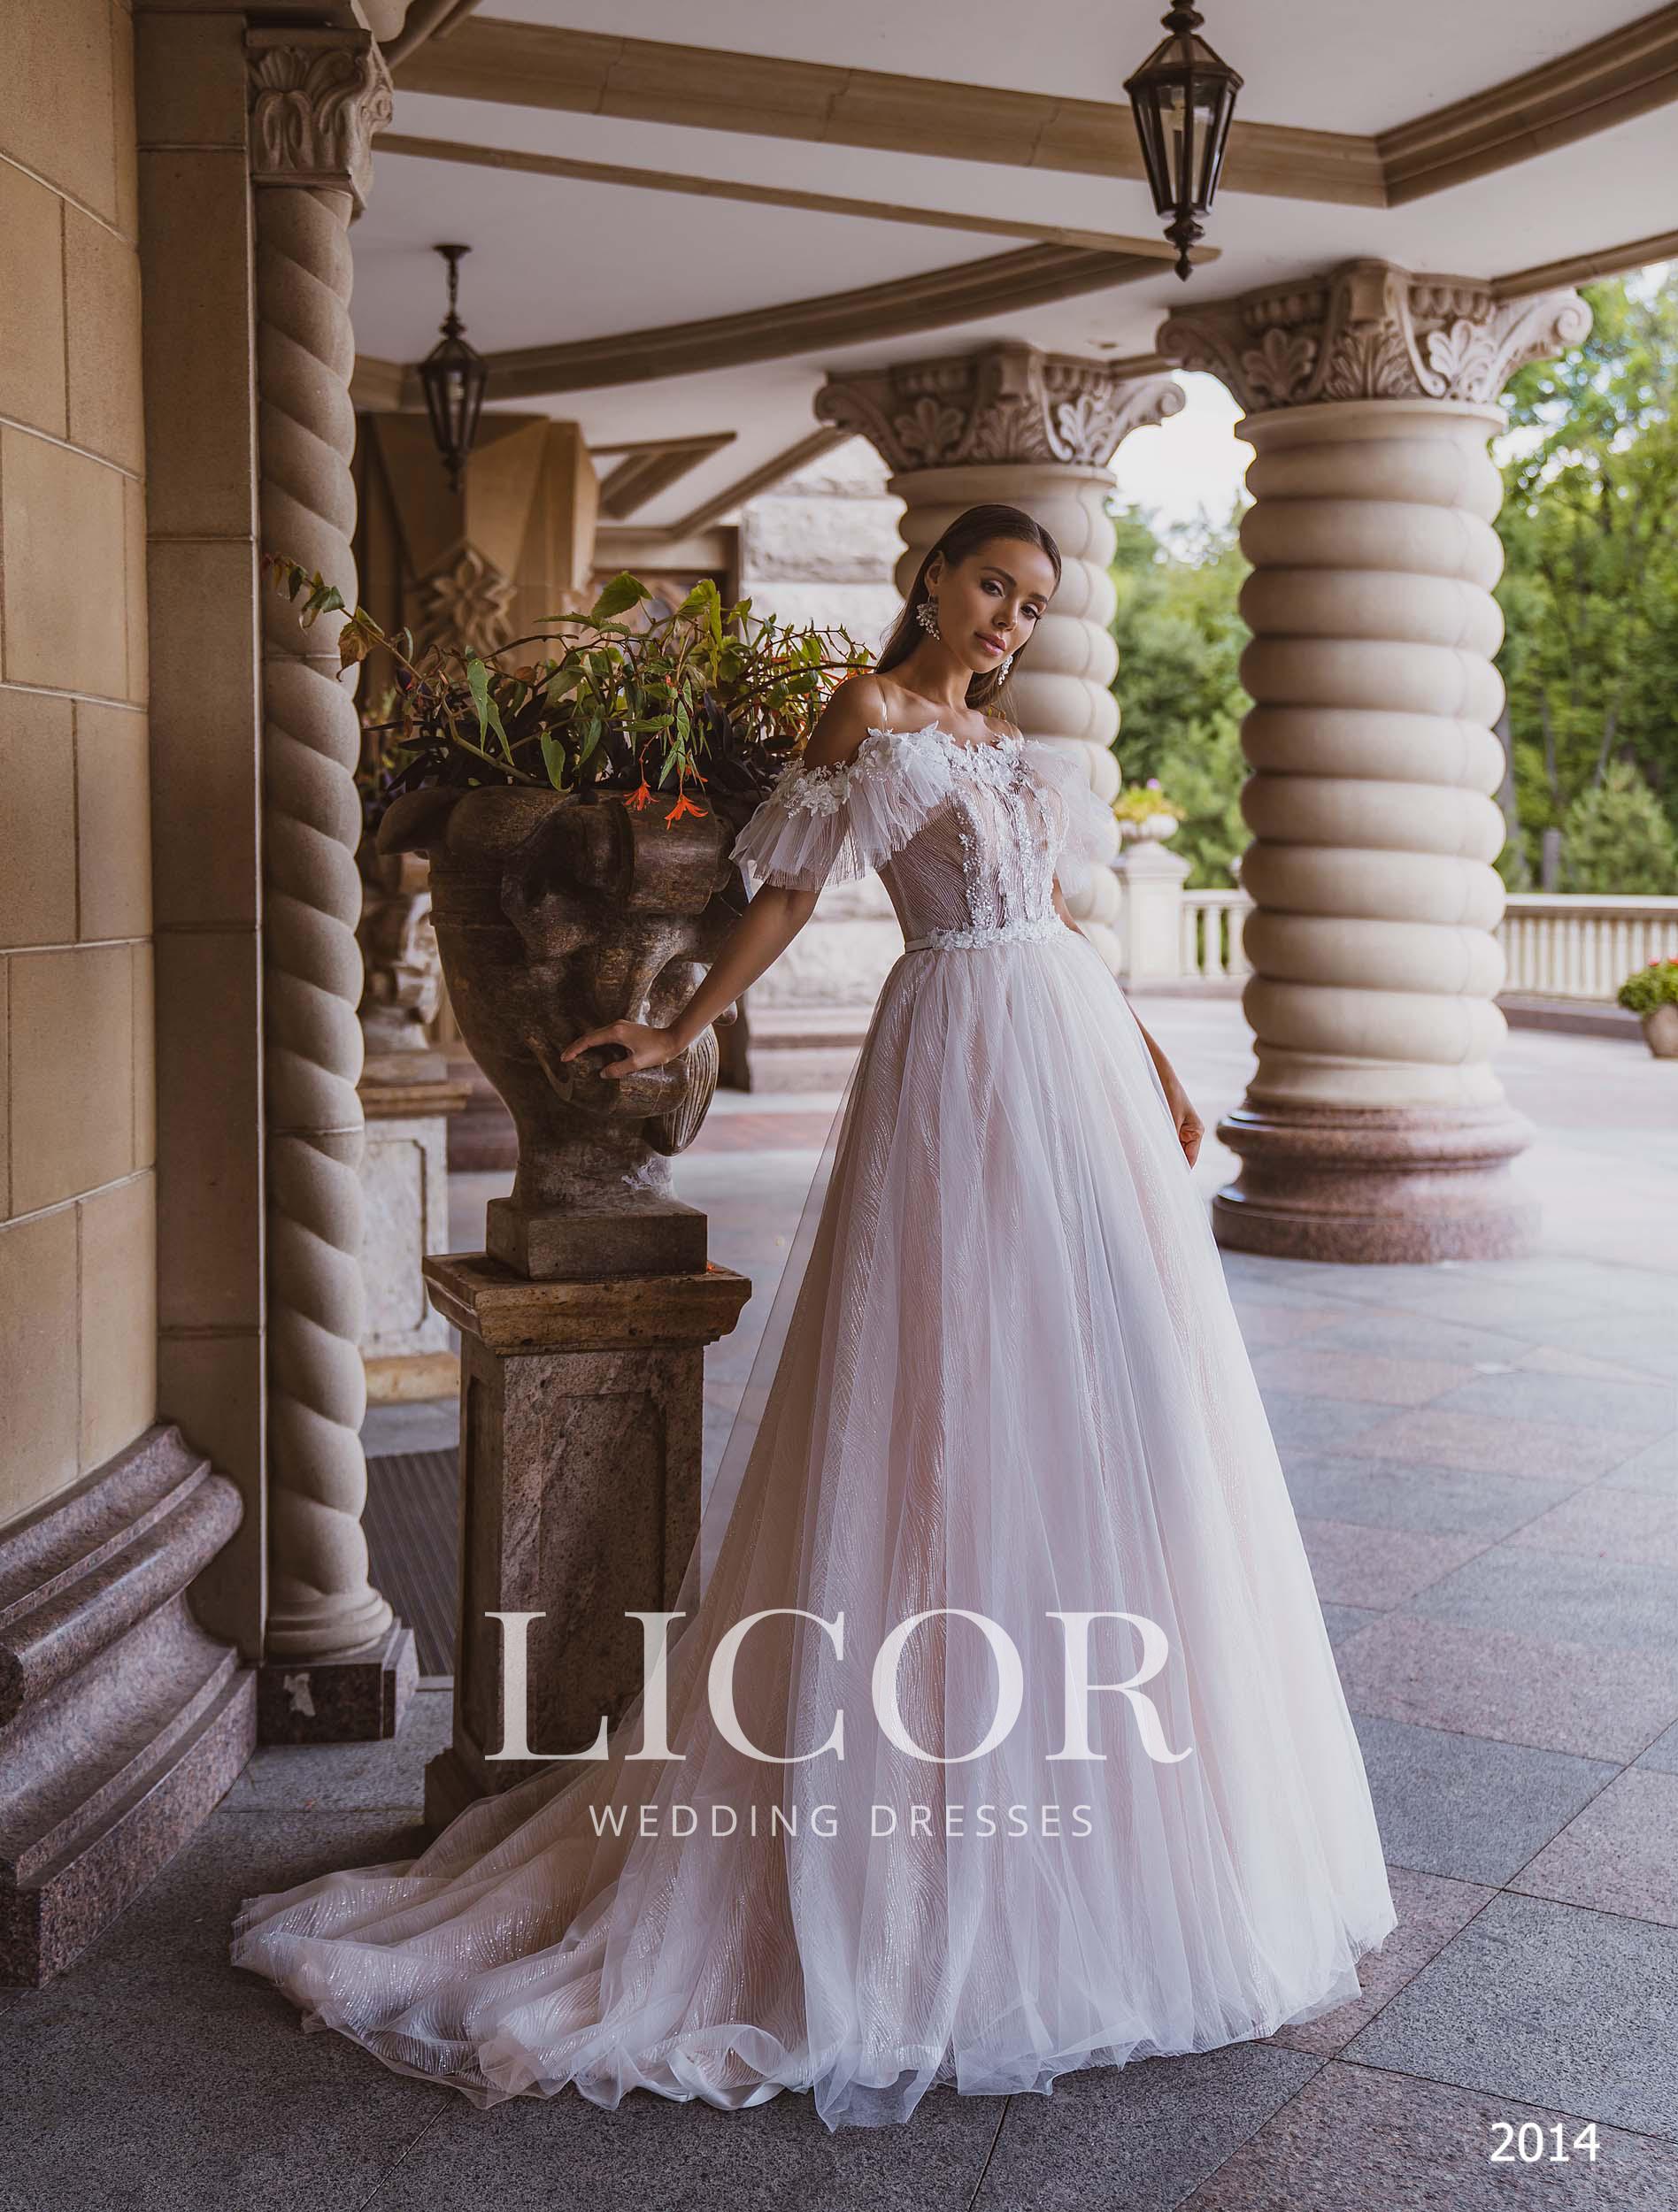 https://licor.com.ua/images/stories/virtuemart/product/2014-------(1).jpg